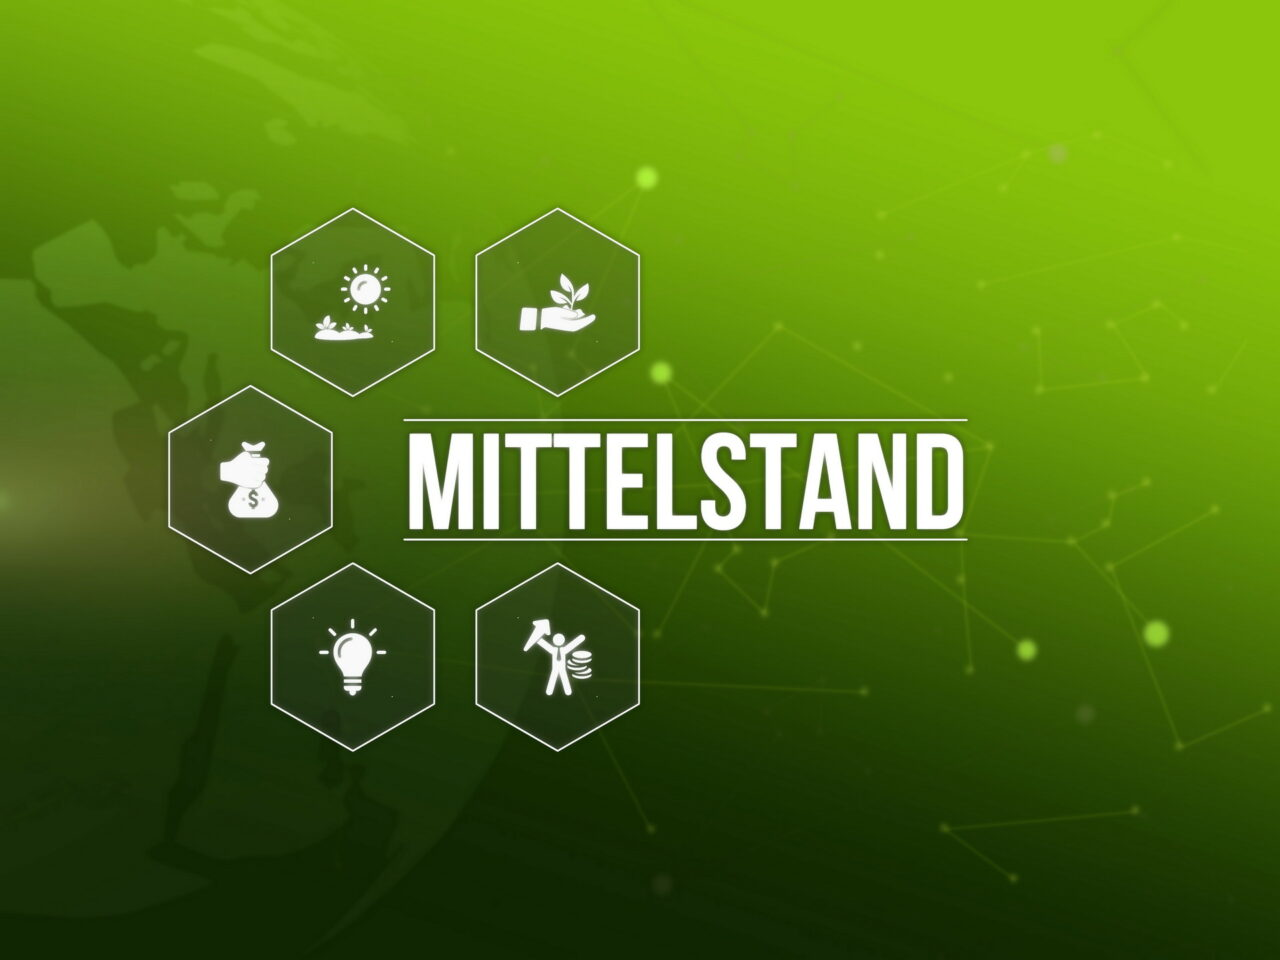 https://intelligent-investors.de/wp-content/uploads/2021/04/Mittelstand_2-1280x960.jpg